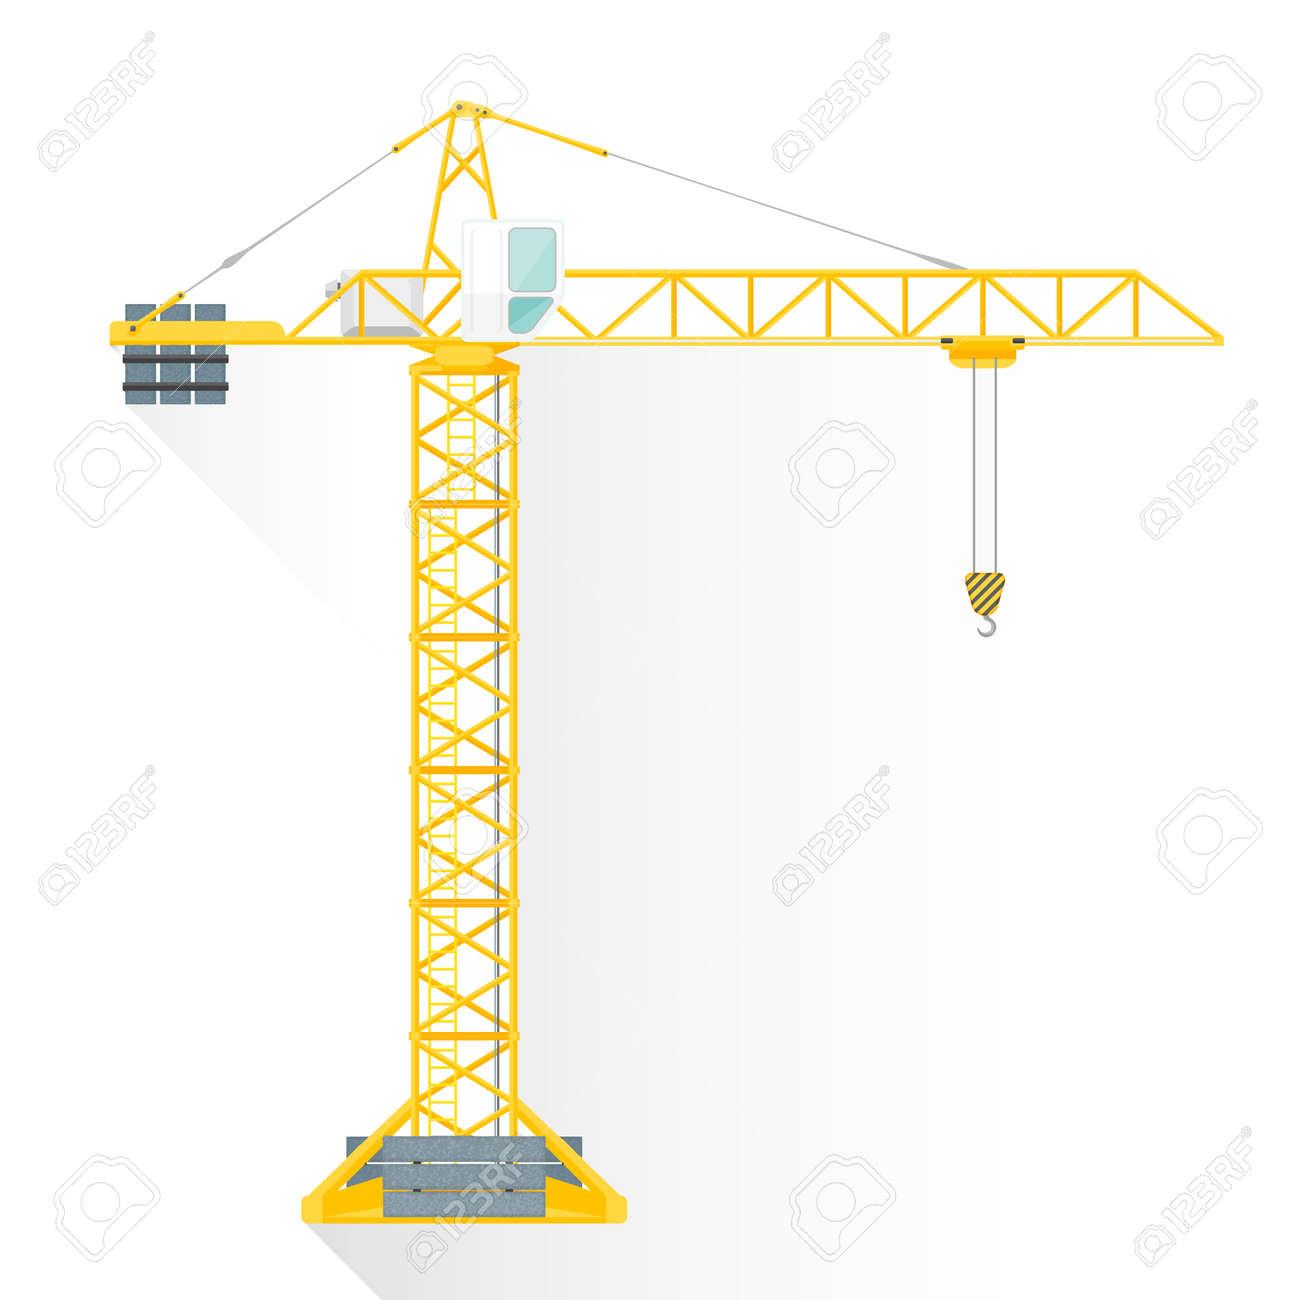 vector yellow color flat design construction tower crane white